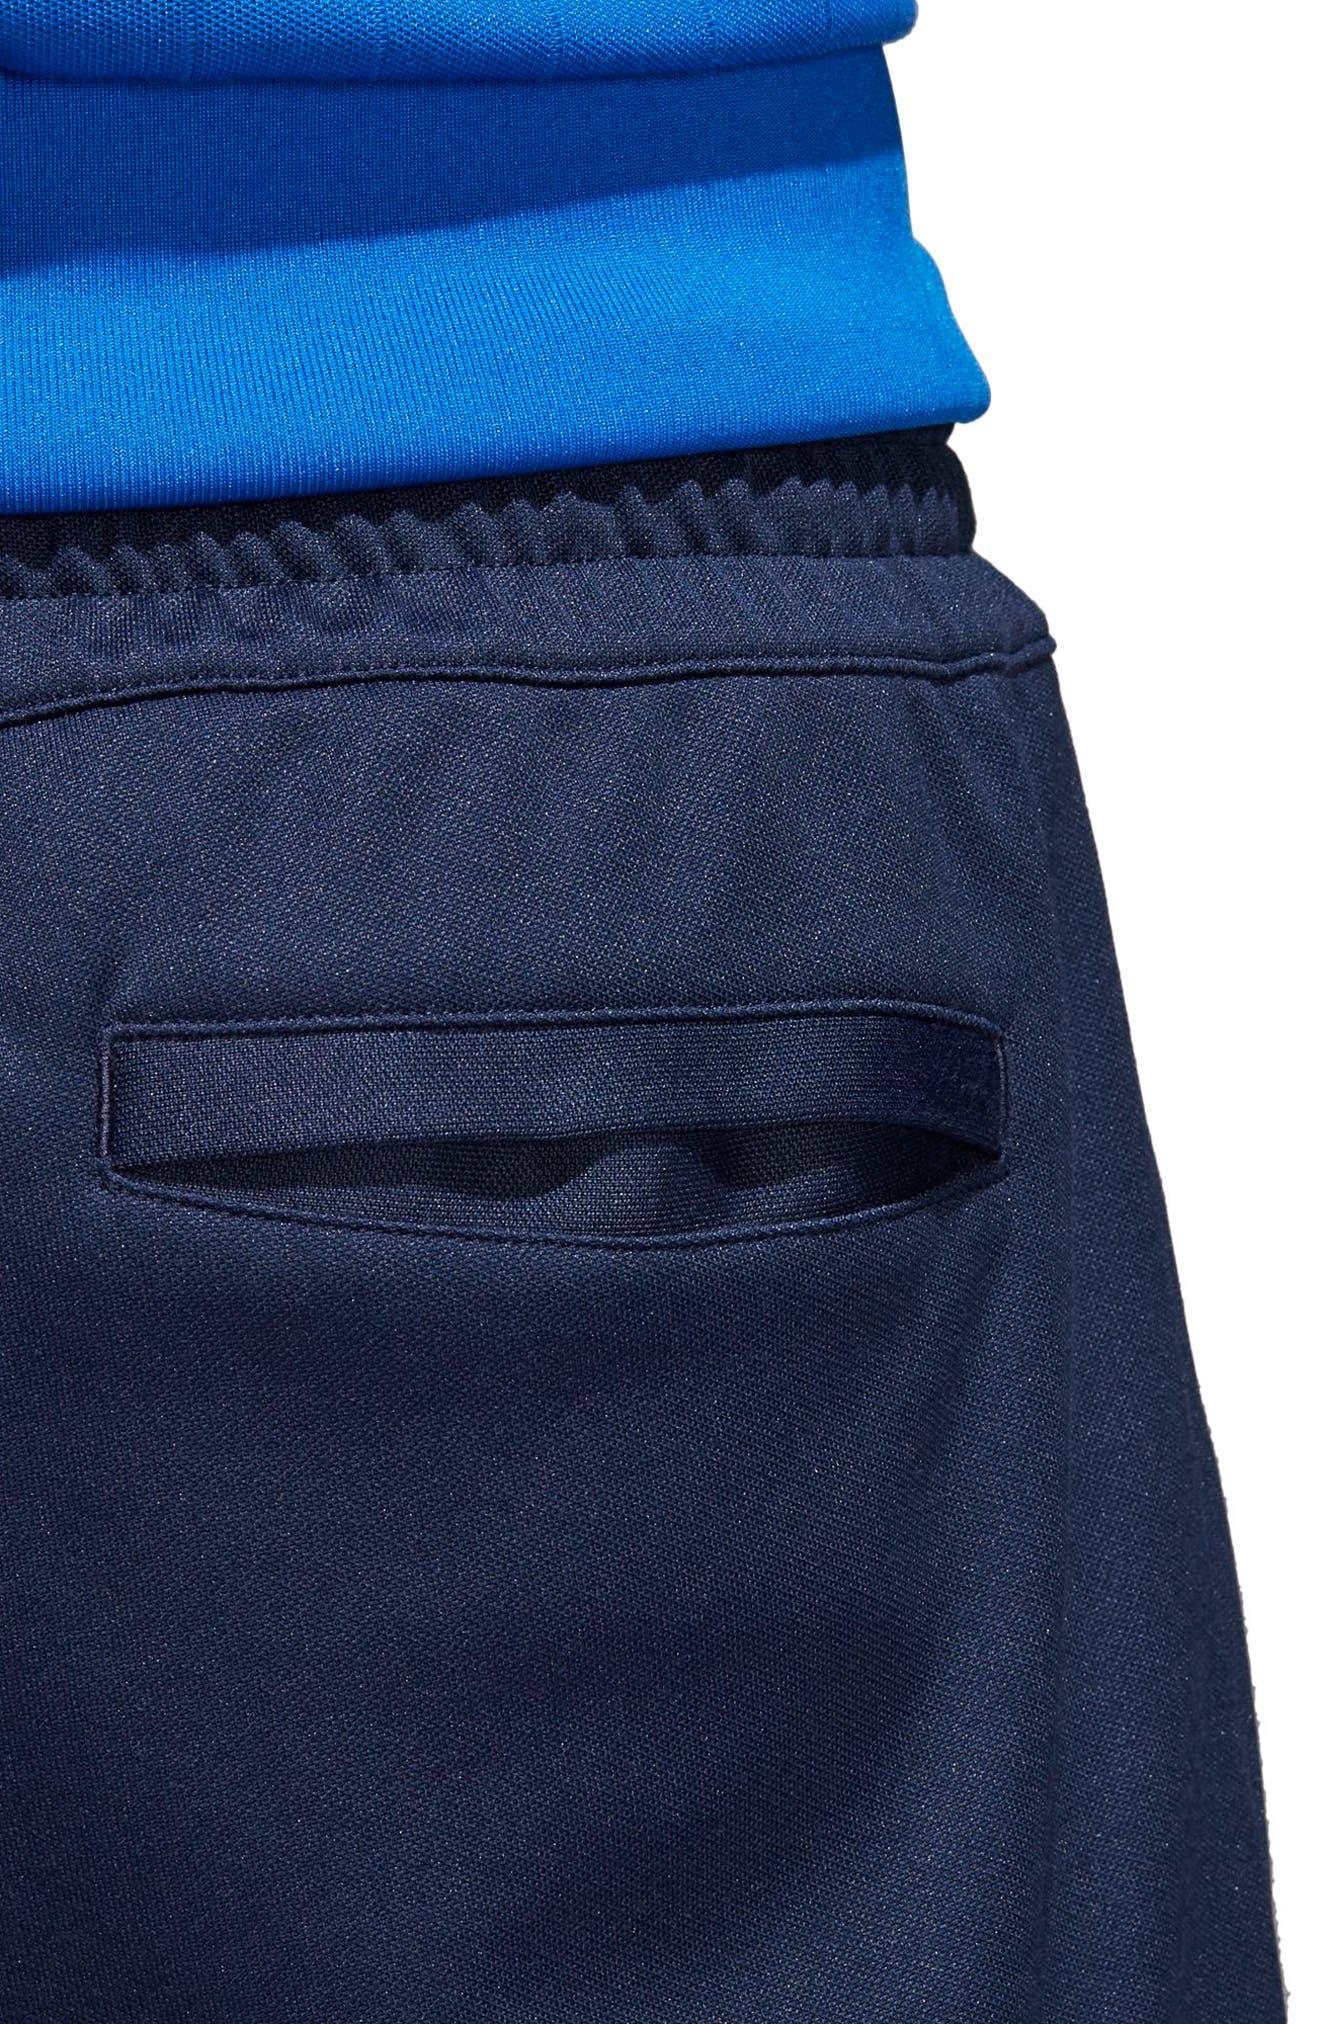 Originals Training Pants,                             Alternate thumbnail 4, color,                             Collegiate Navy